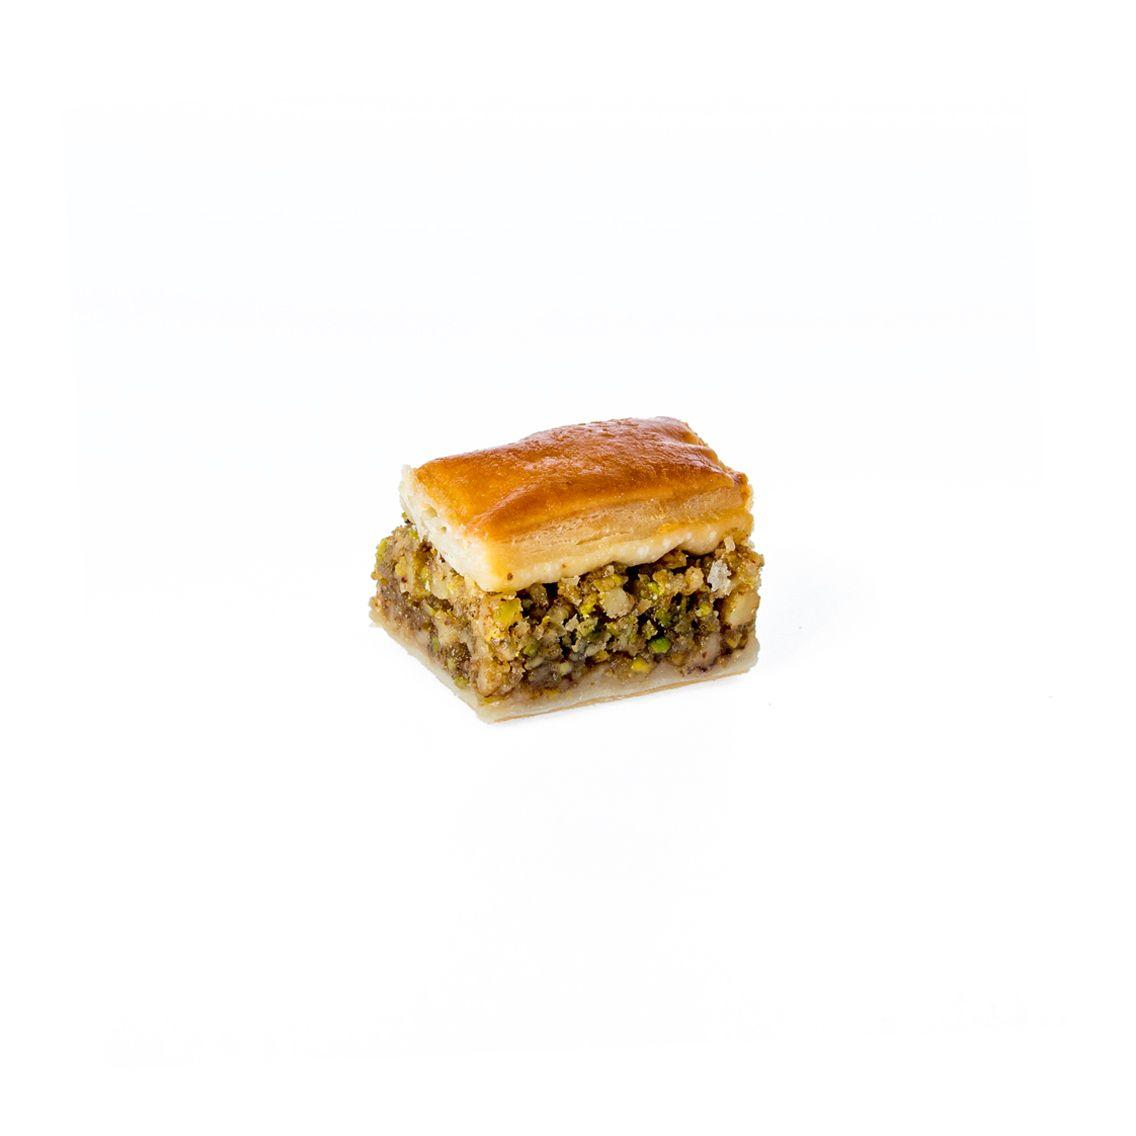 Kitchen Cuisine Default Category Baklava Pastry